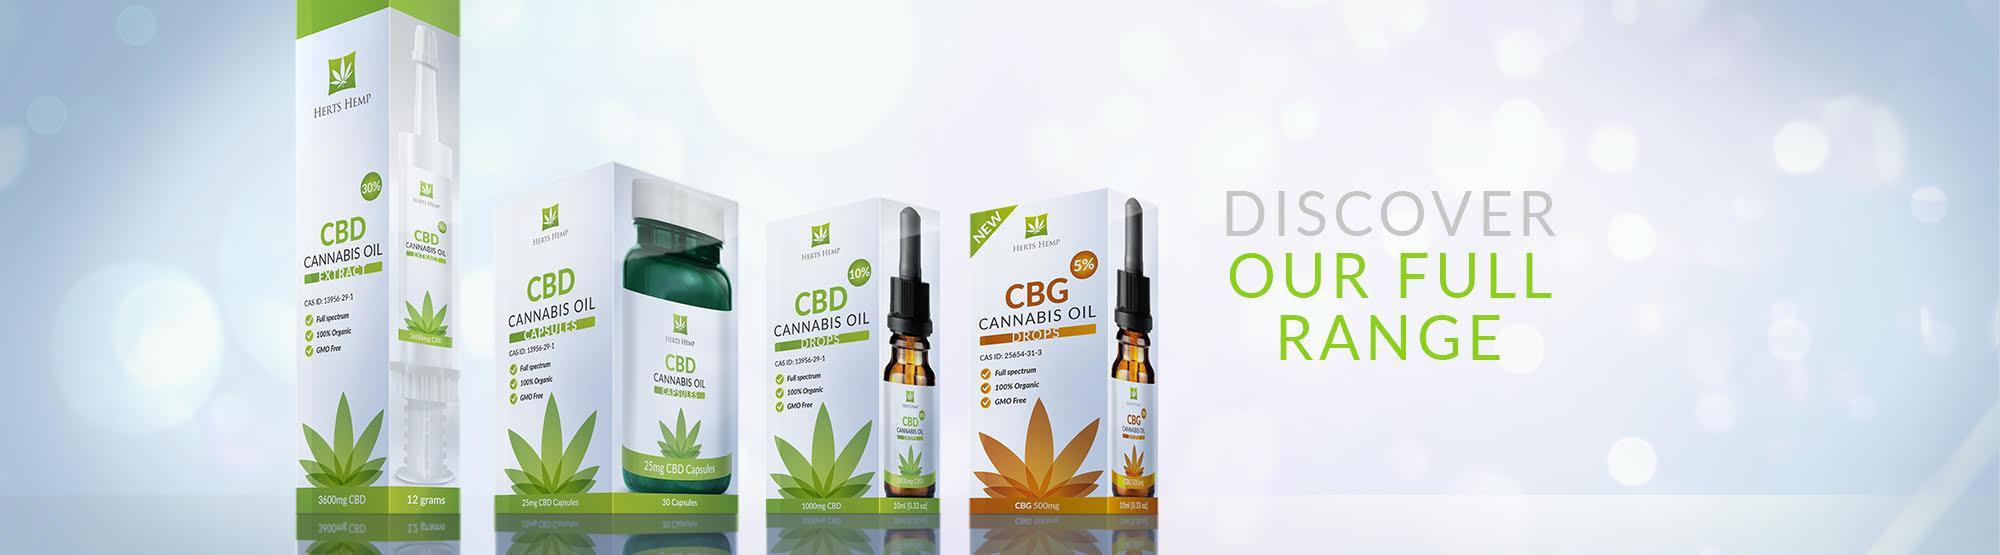 Herts Hemp | Full Spectrum Cannabis Oil with CBD